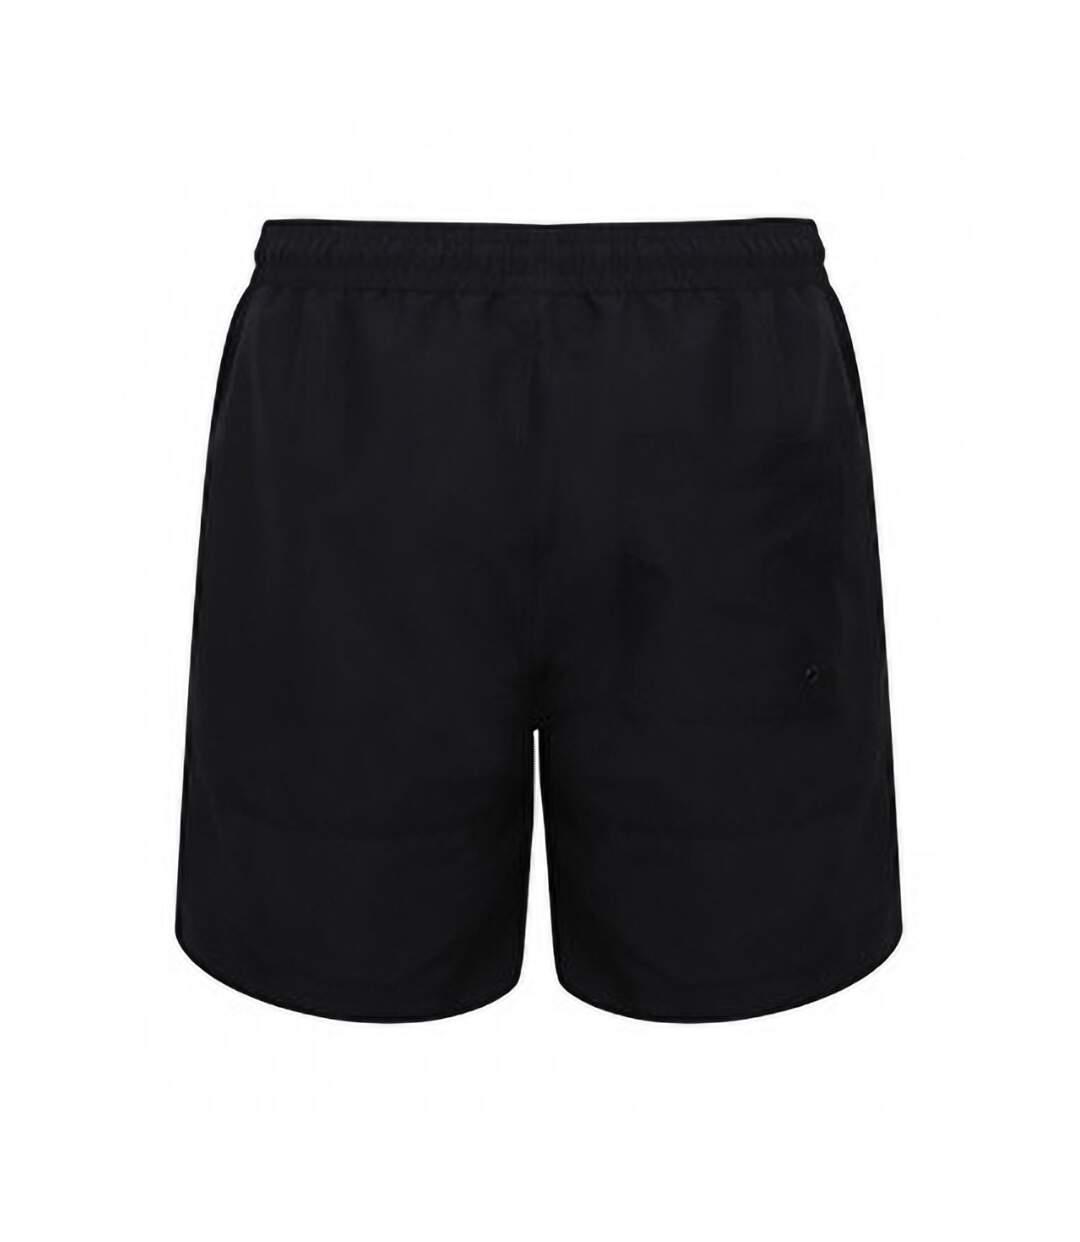 Front Row Mens Board Shorts (Black/Black) - UTPC3154